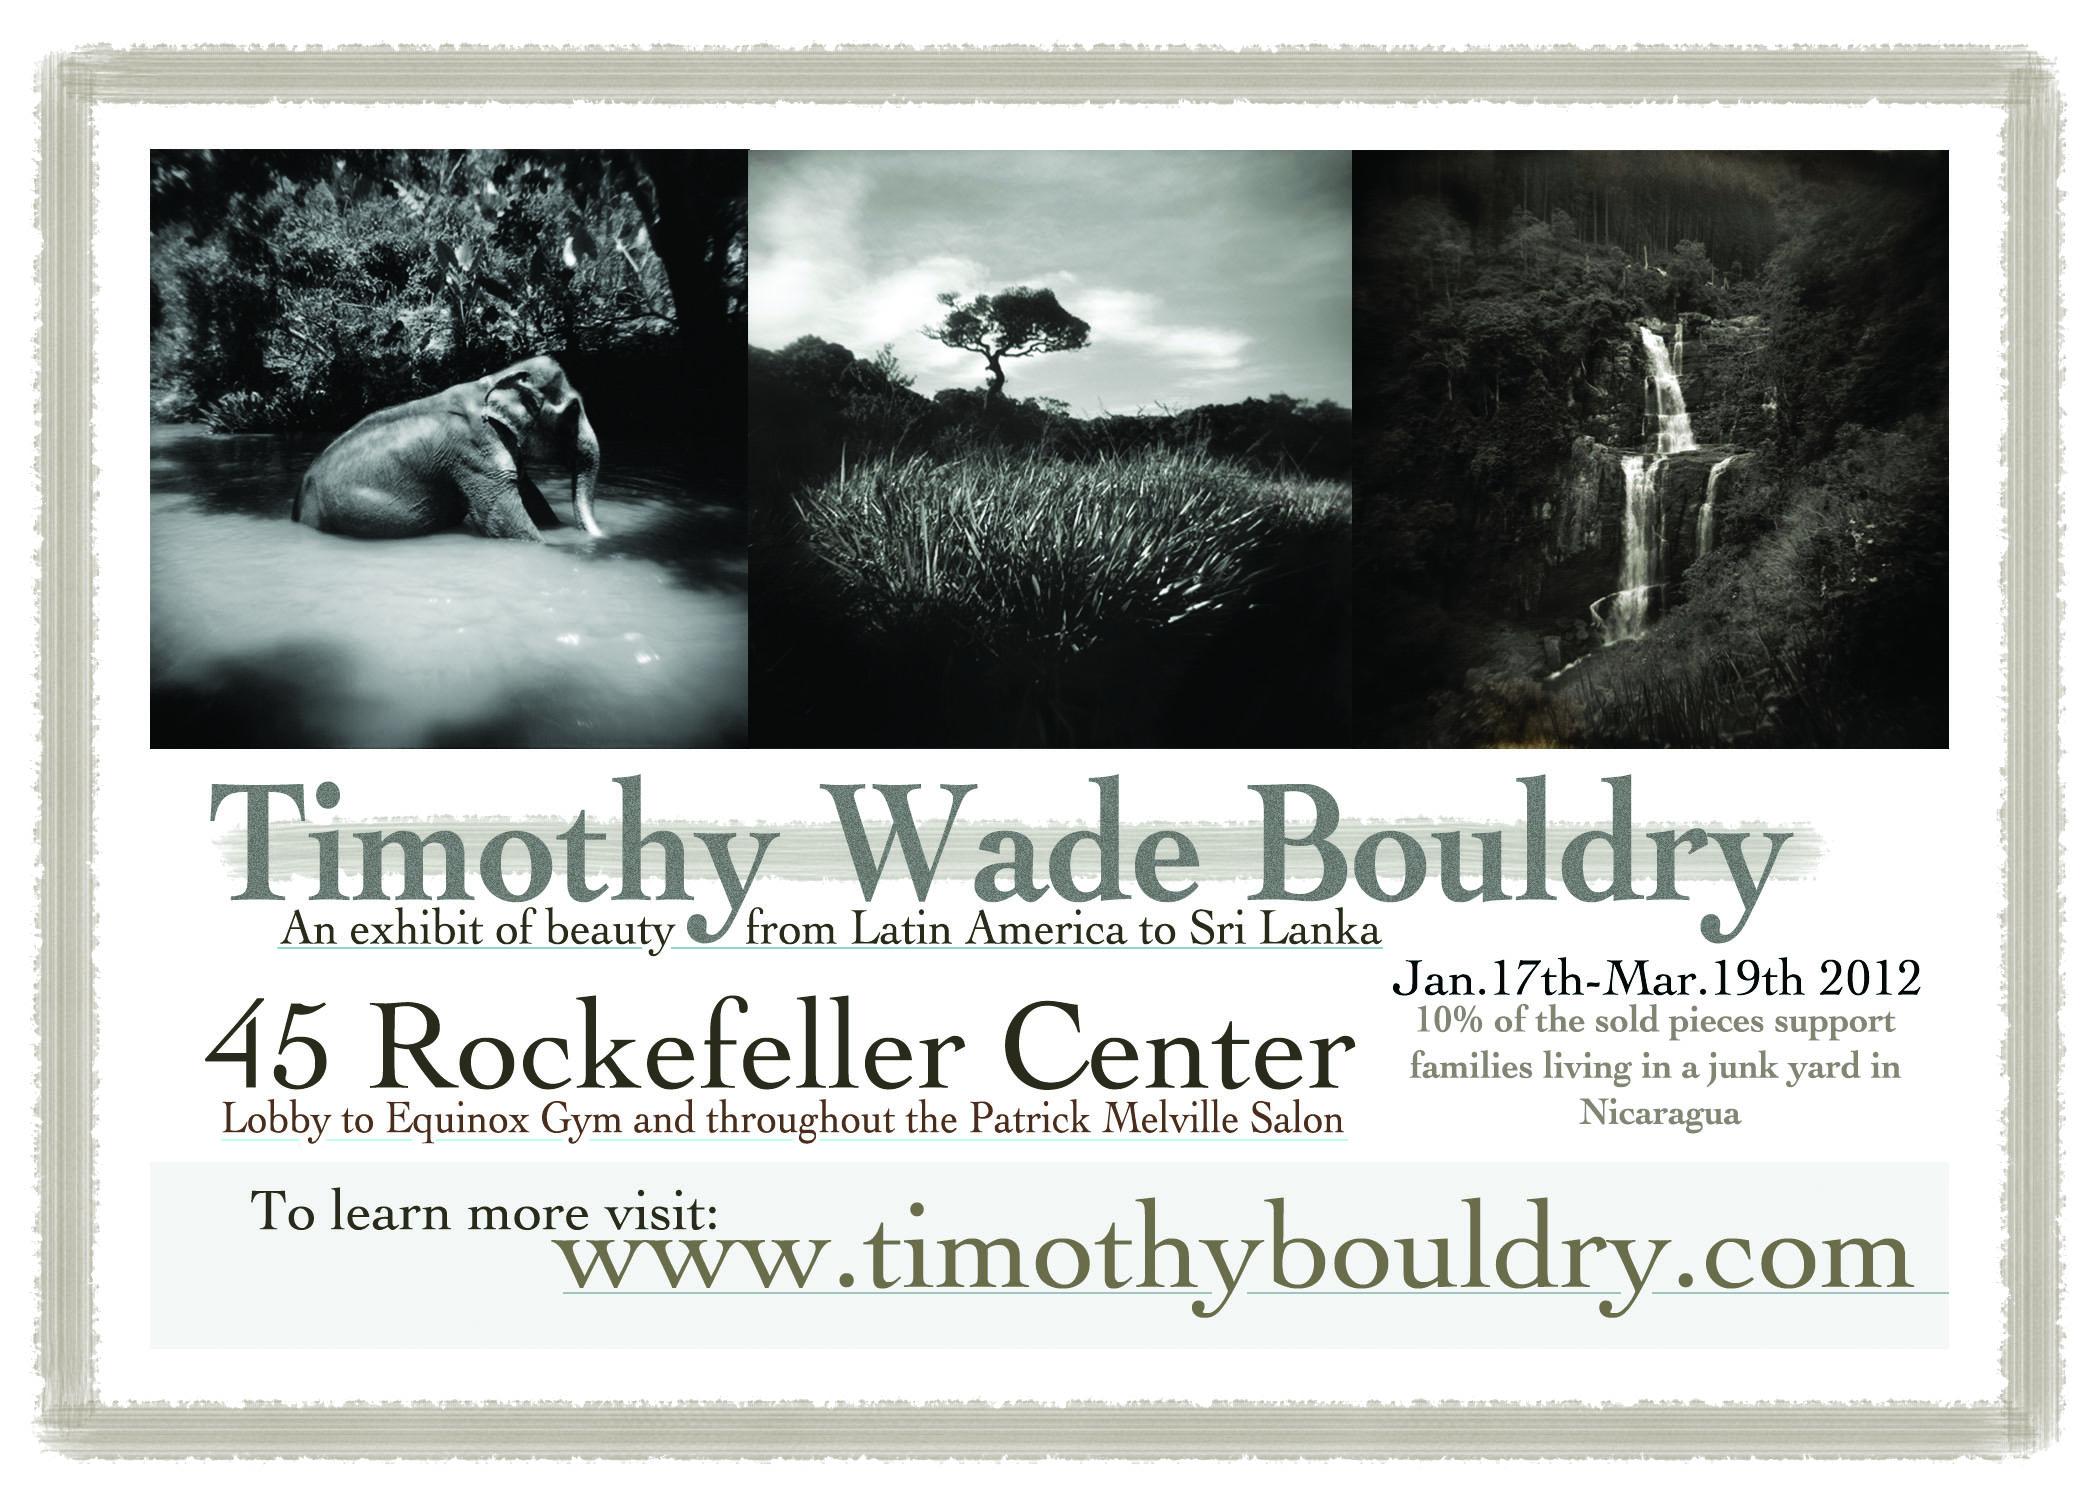 Exhibition at Rockefeller Center.